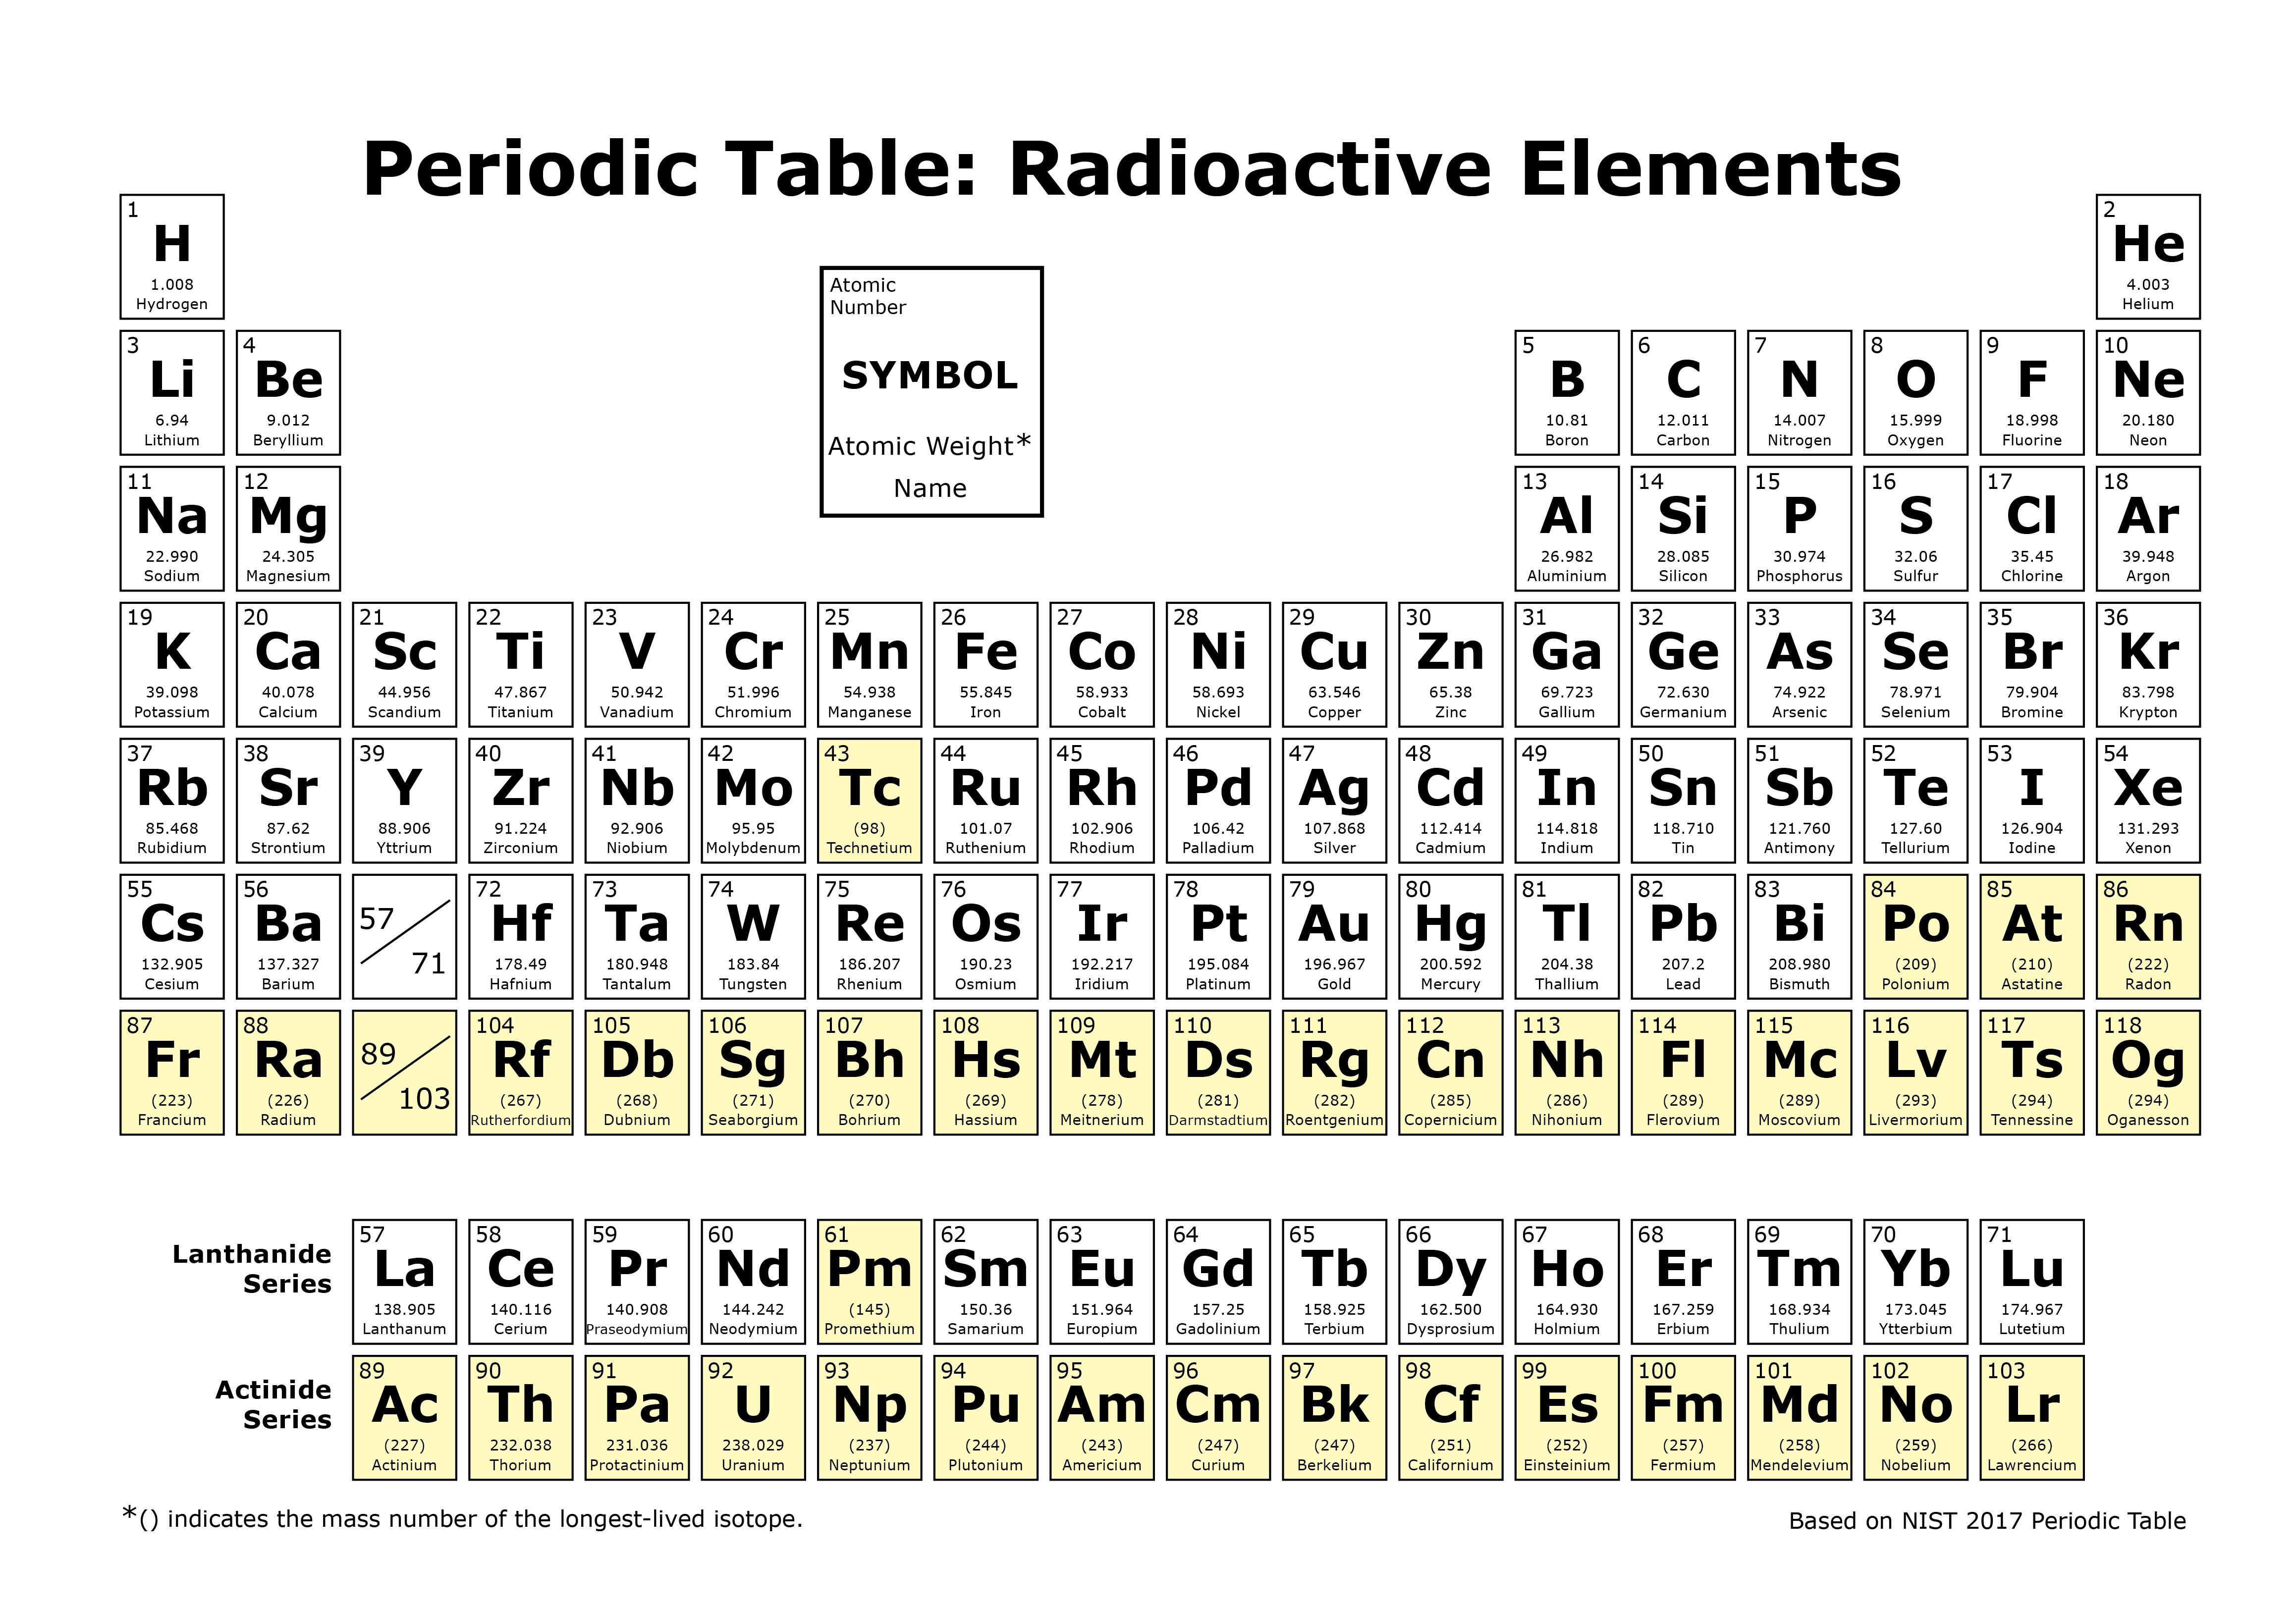 Radioactive Decay Radiation Protection Us Epa